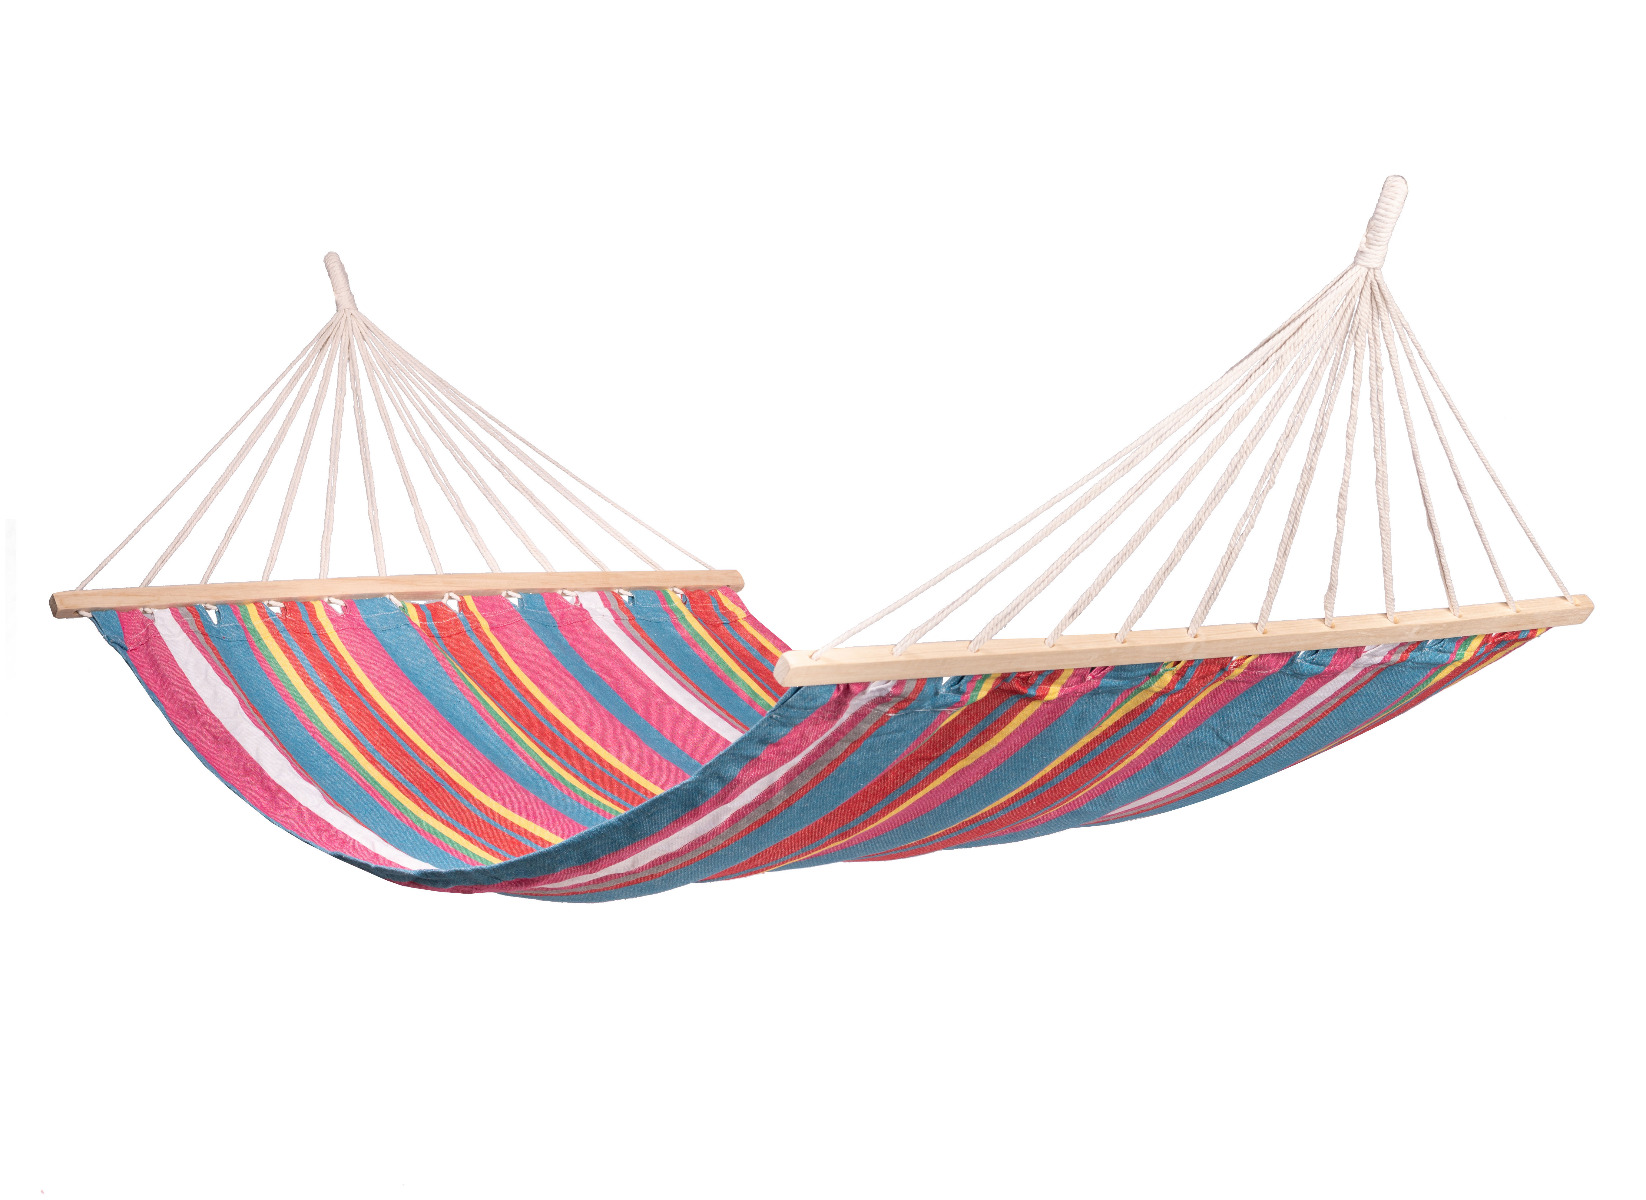 'Salvora' Spreaderbar E�npersoons Hangmat - Veelkleurig - 123 Hammock